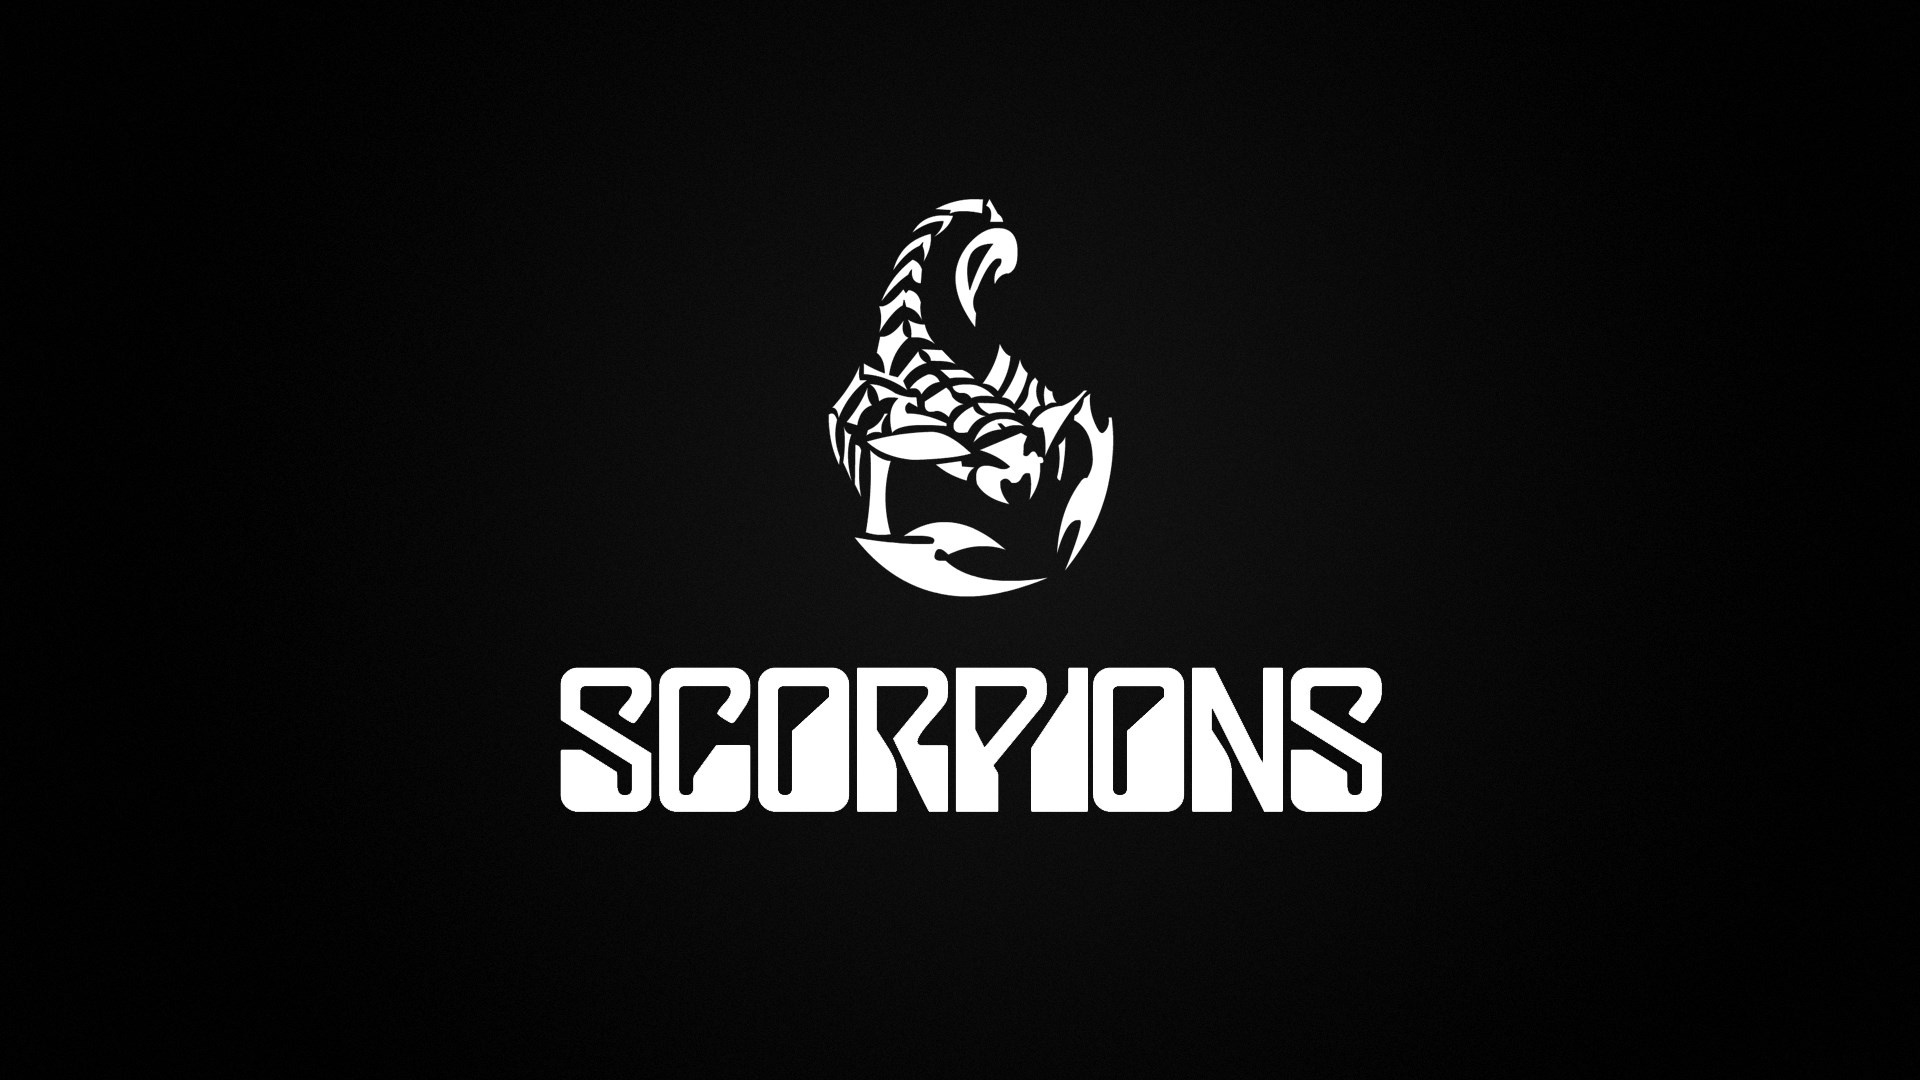 The animals band logo scorpions band logo - Scorpions Band Logo Wallpapers 1920x1080 293587